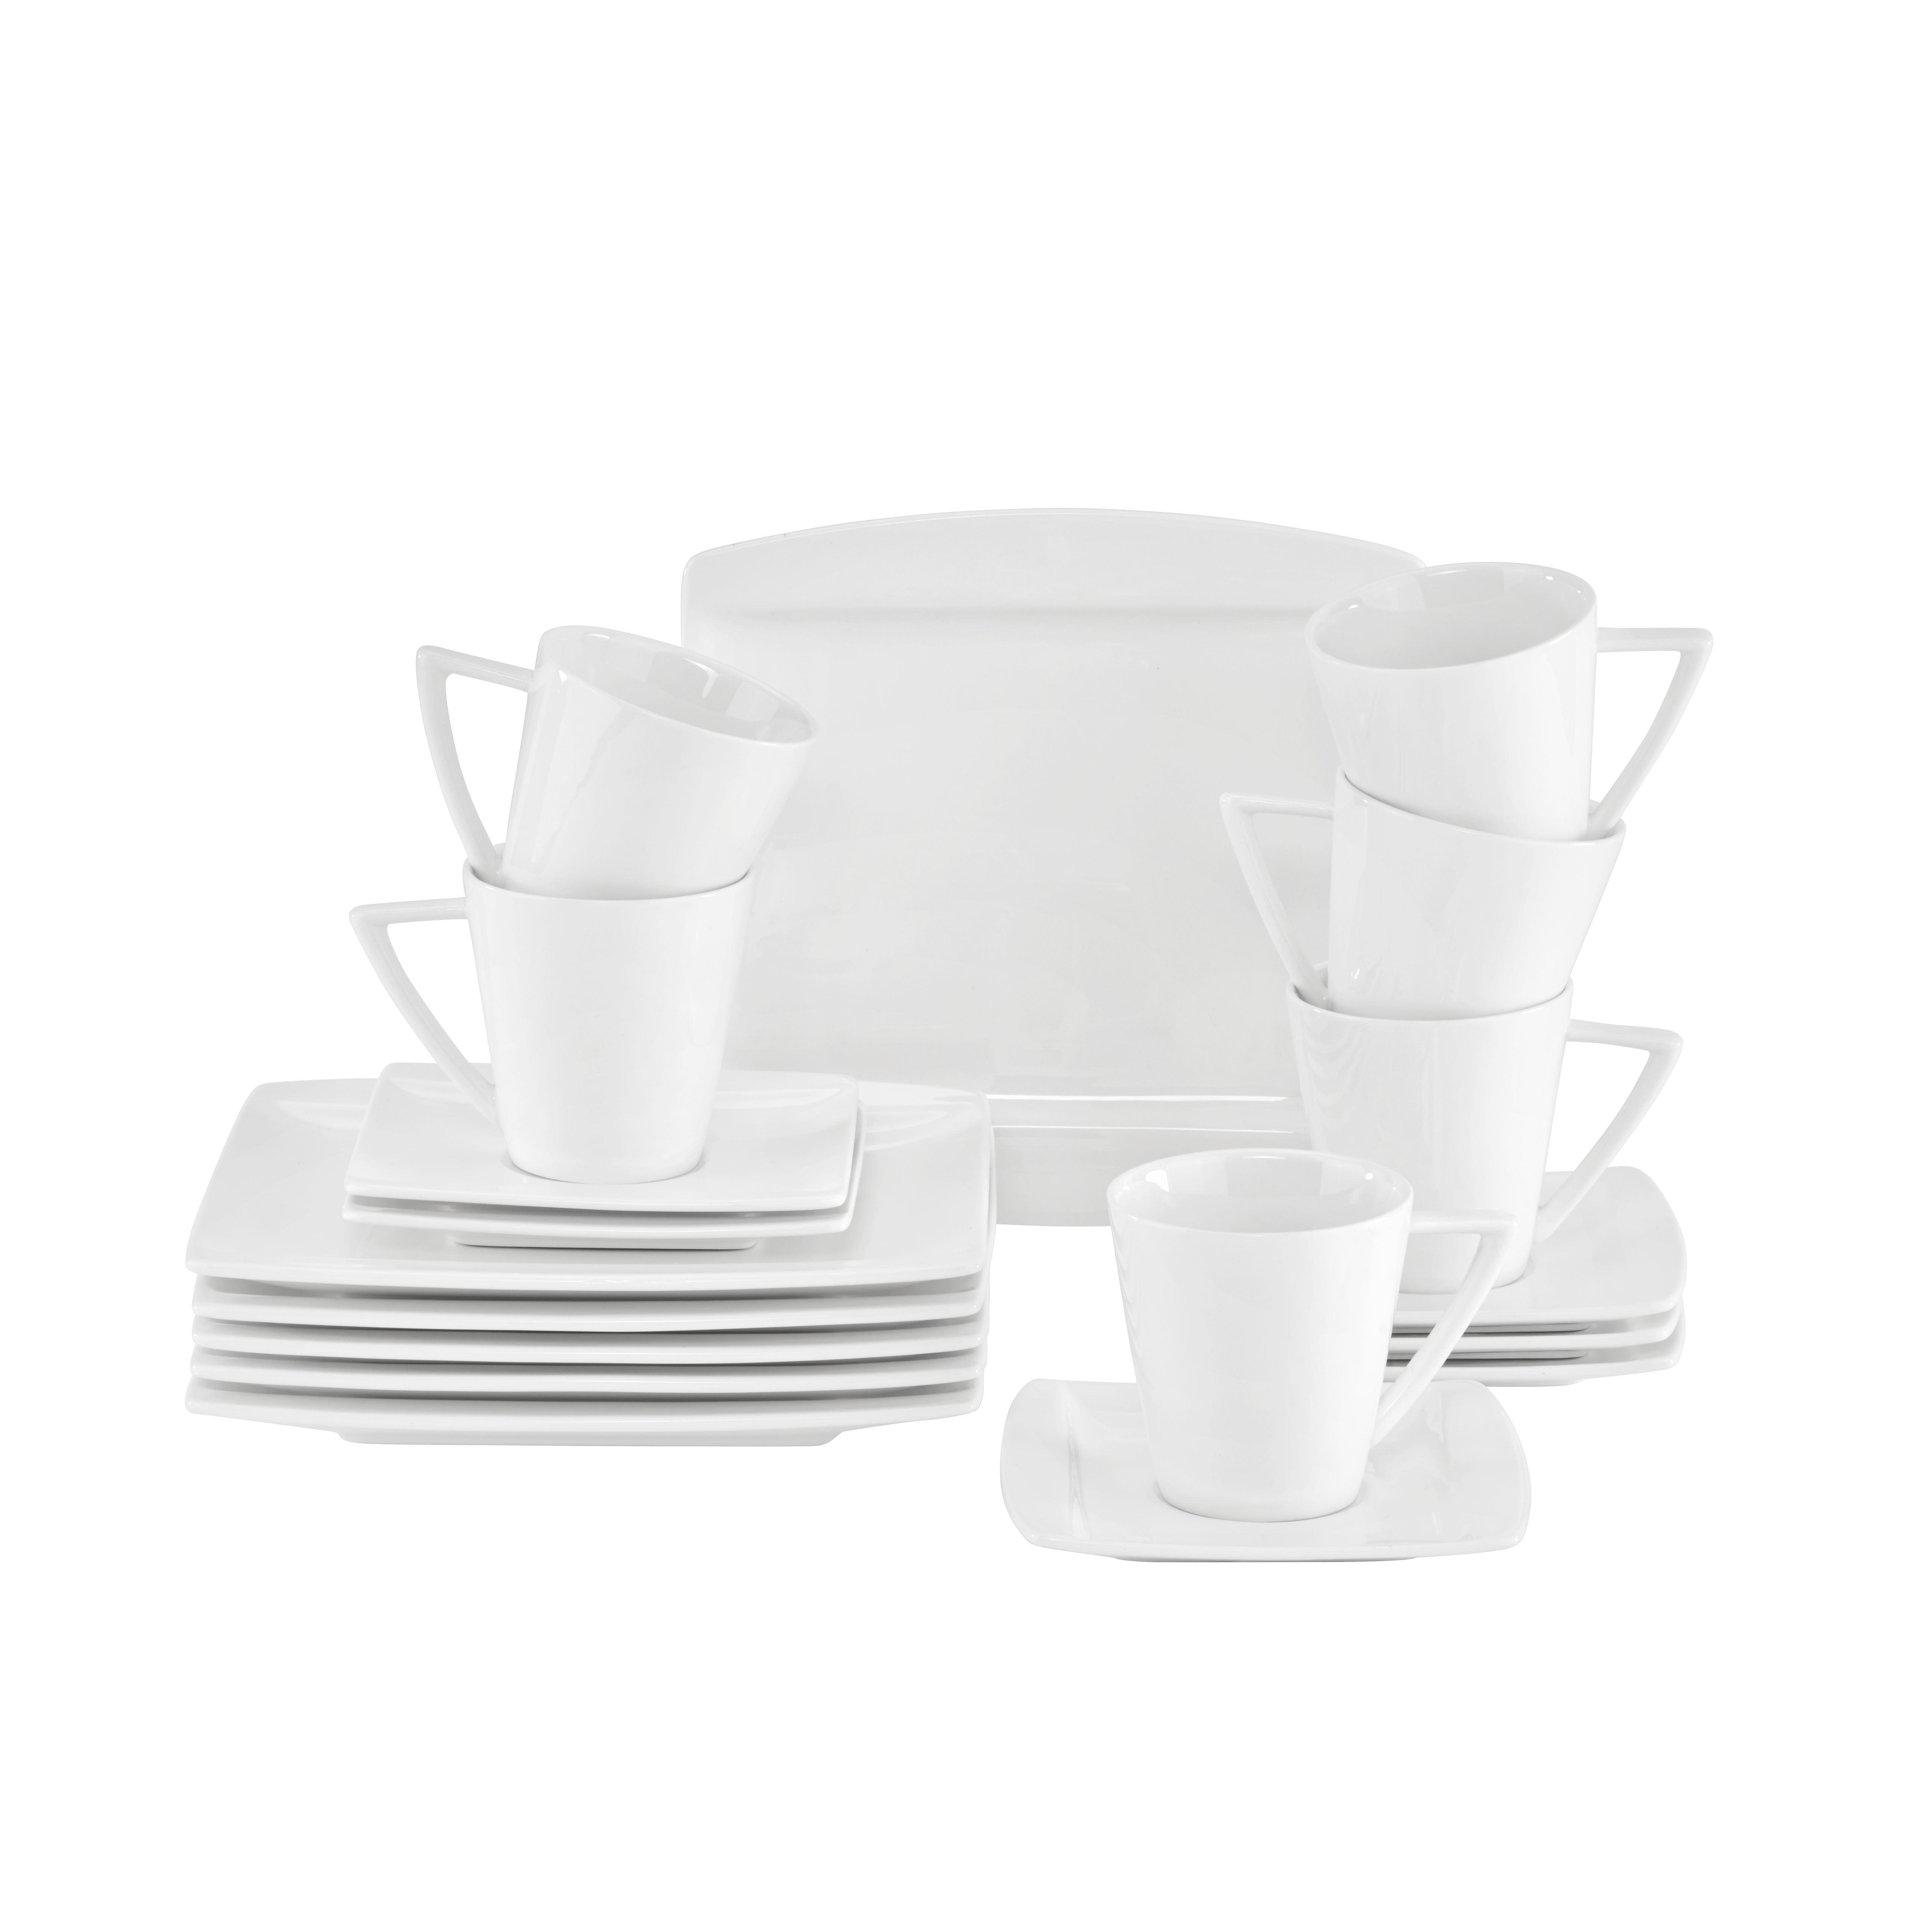 Vrček Za Mleko Pura - bela, Trendi, keramika (7,5/10cm) - MÖMAX modern living